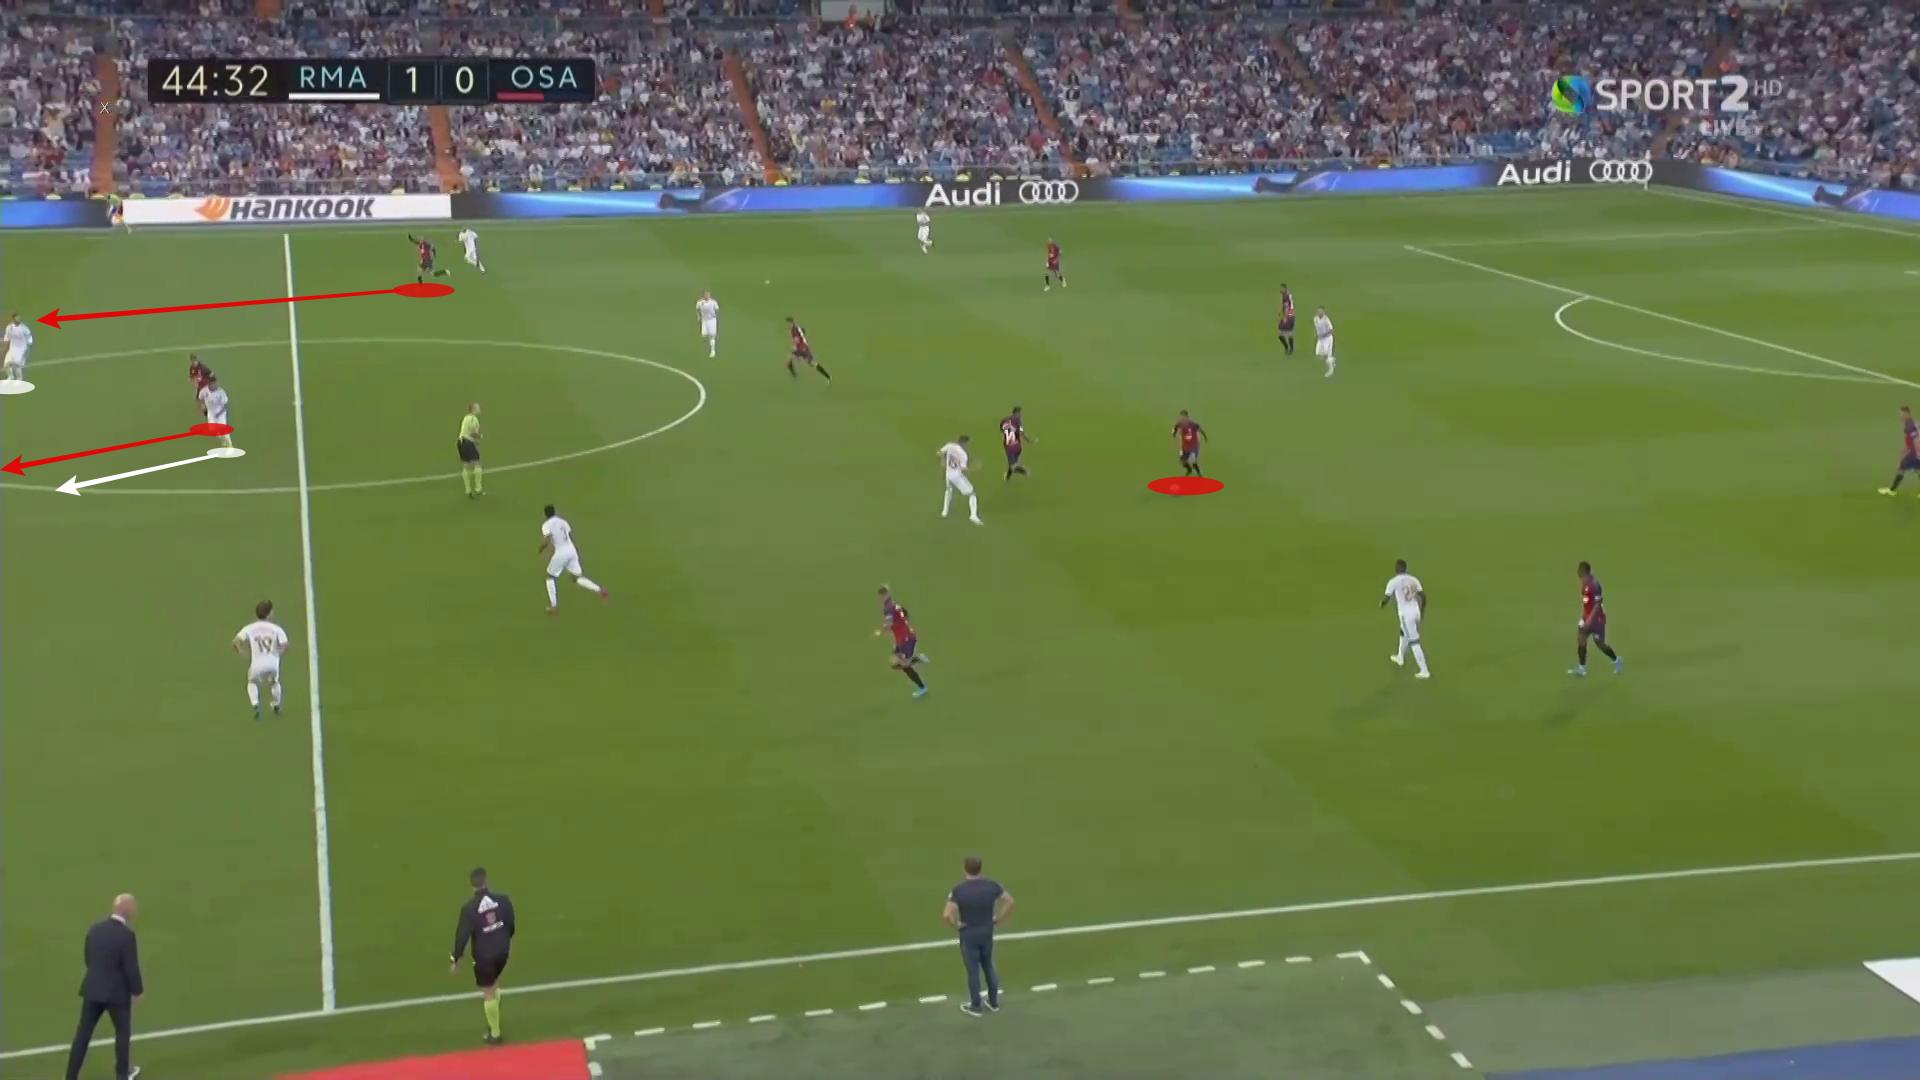 La Liga 2019/20: Real Madrid vs Osasuna - tactical analysis tactics